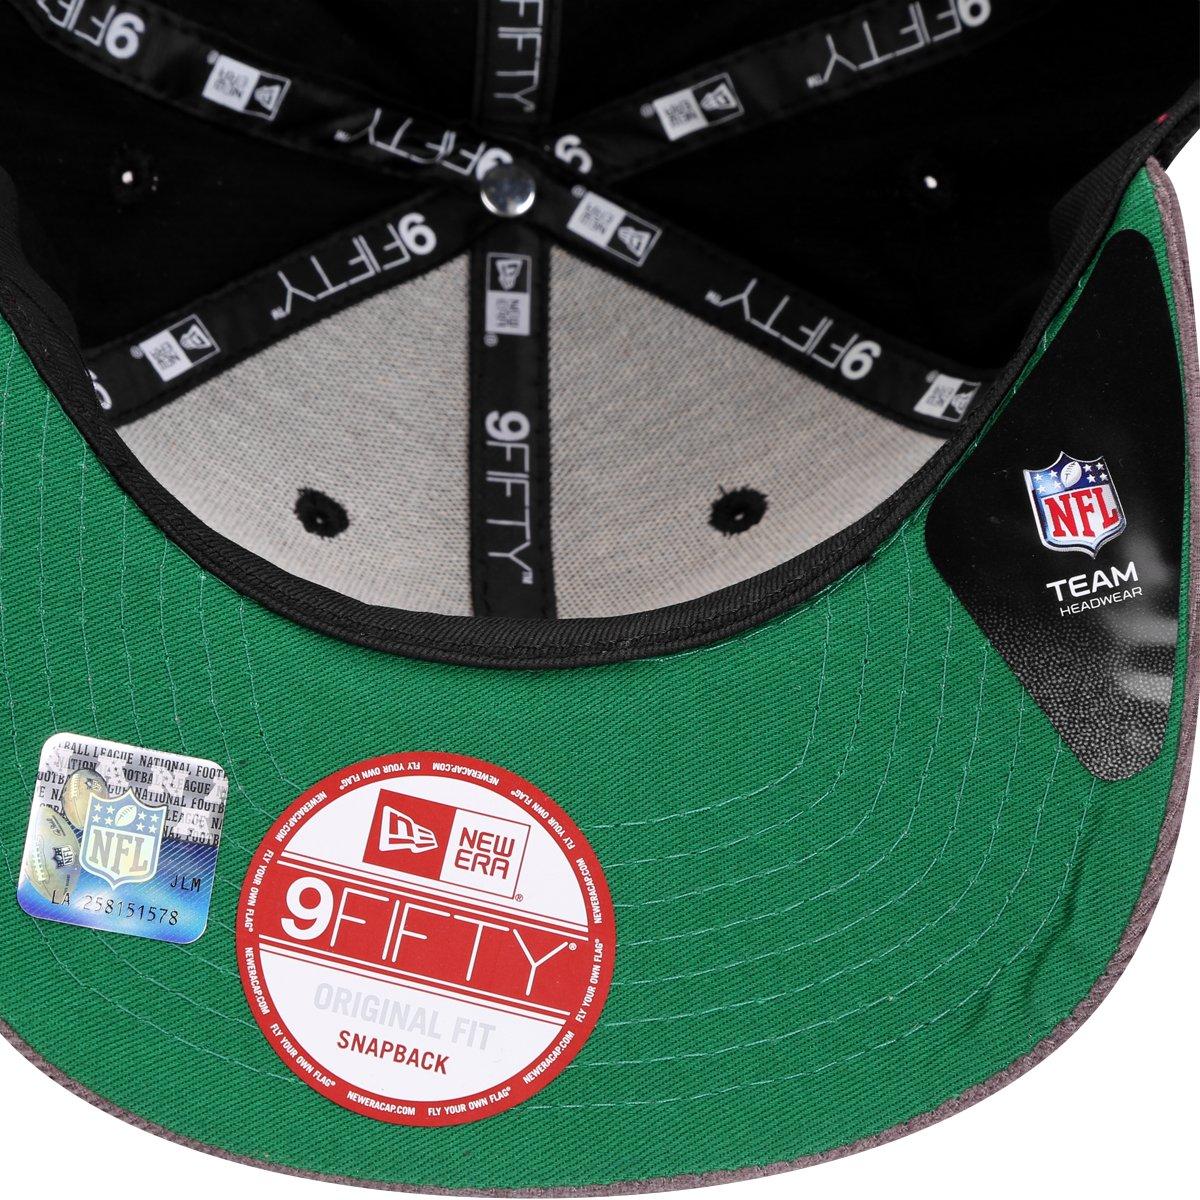 Boné New Era 950 NFL Original Fit Classic Oakland Raiders - Compre ... 778ed203f55